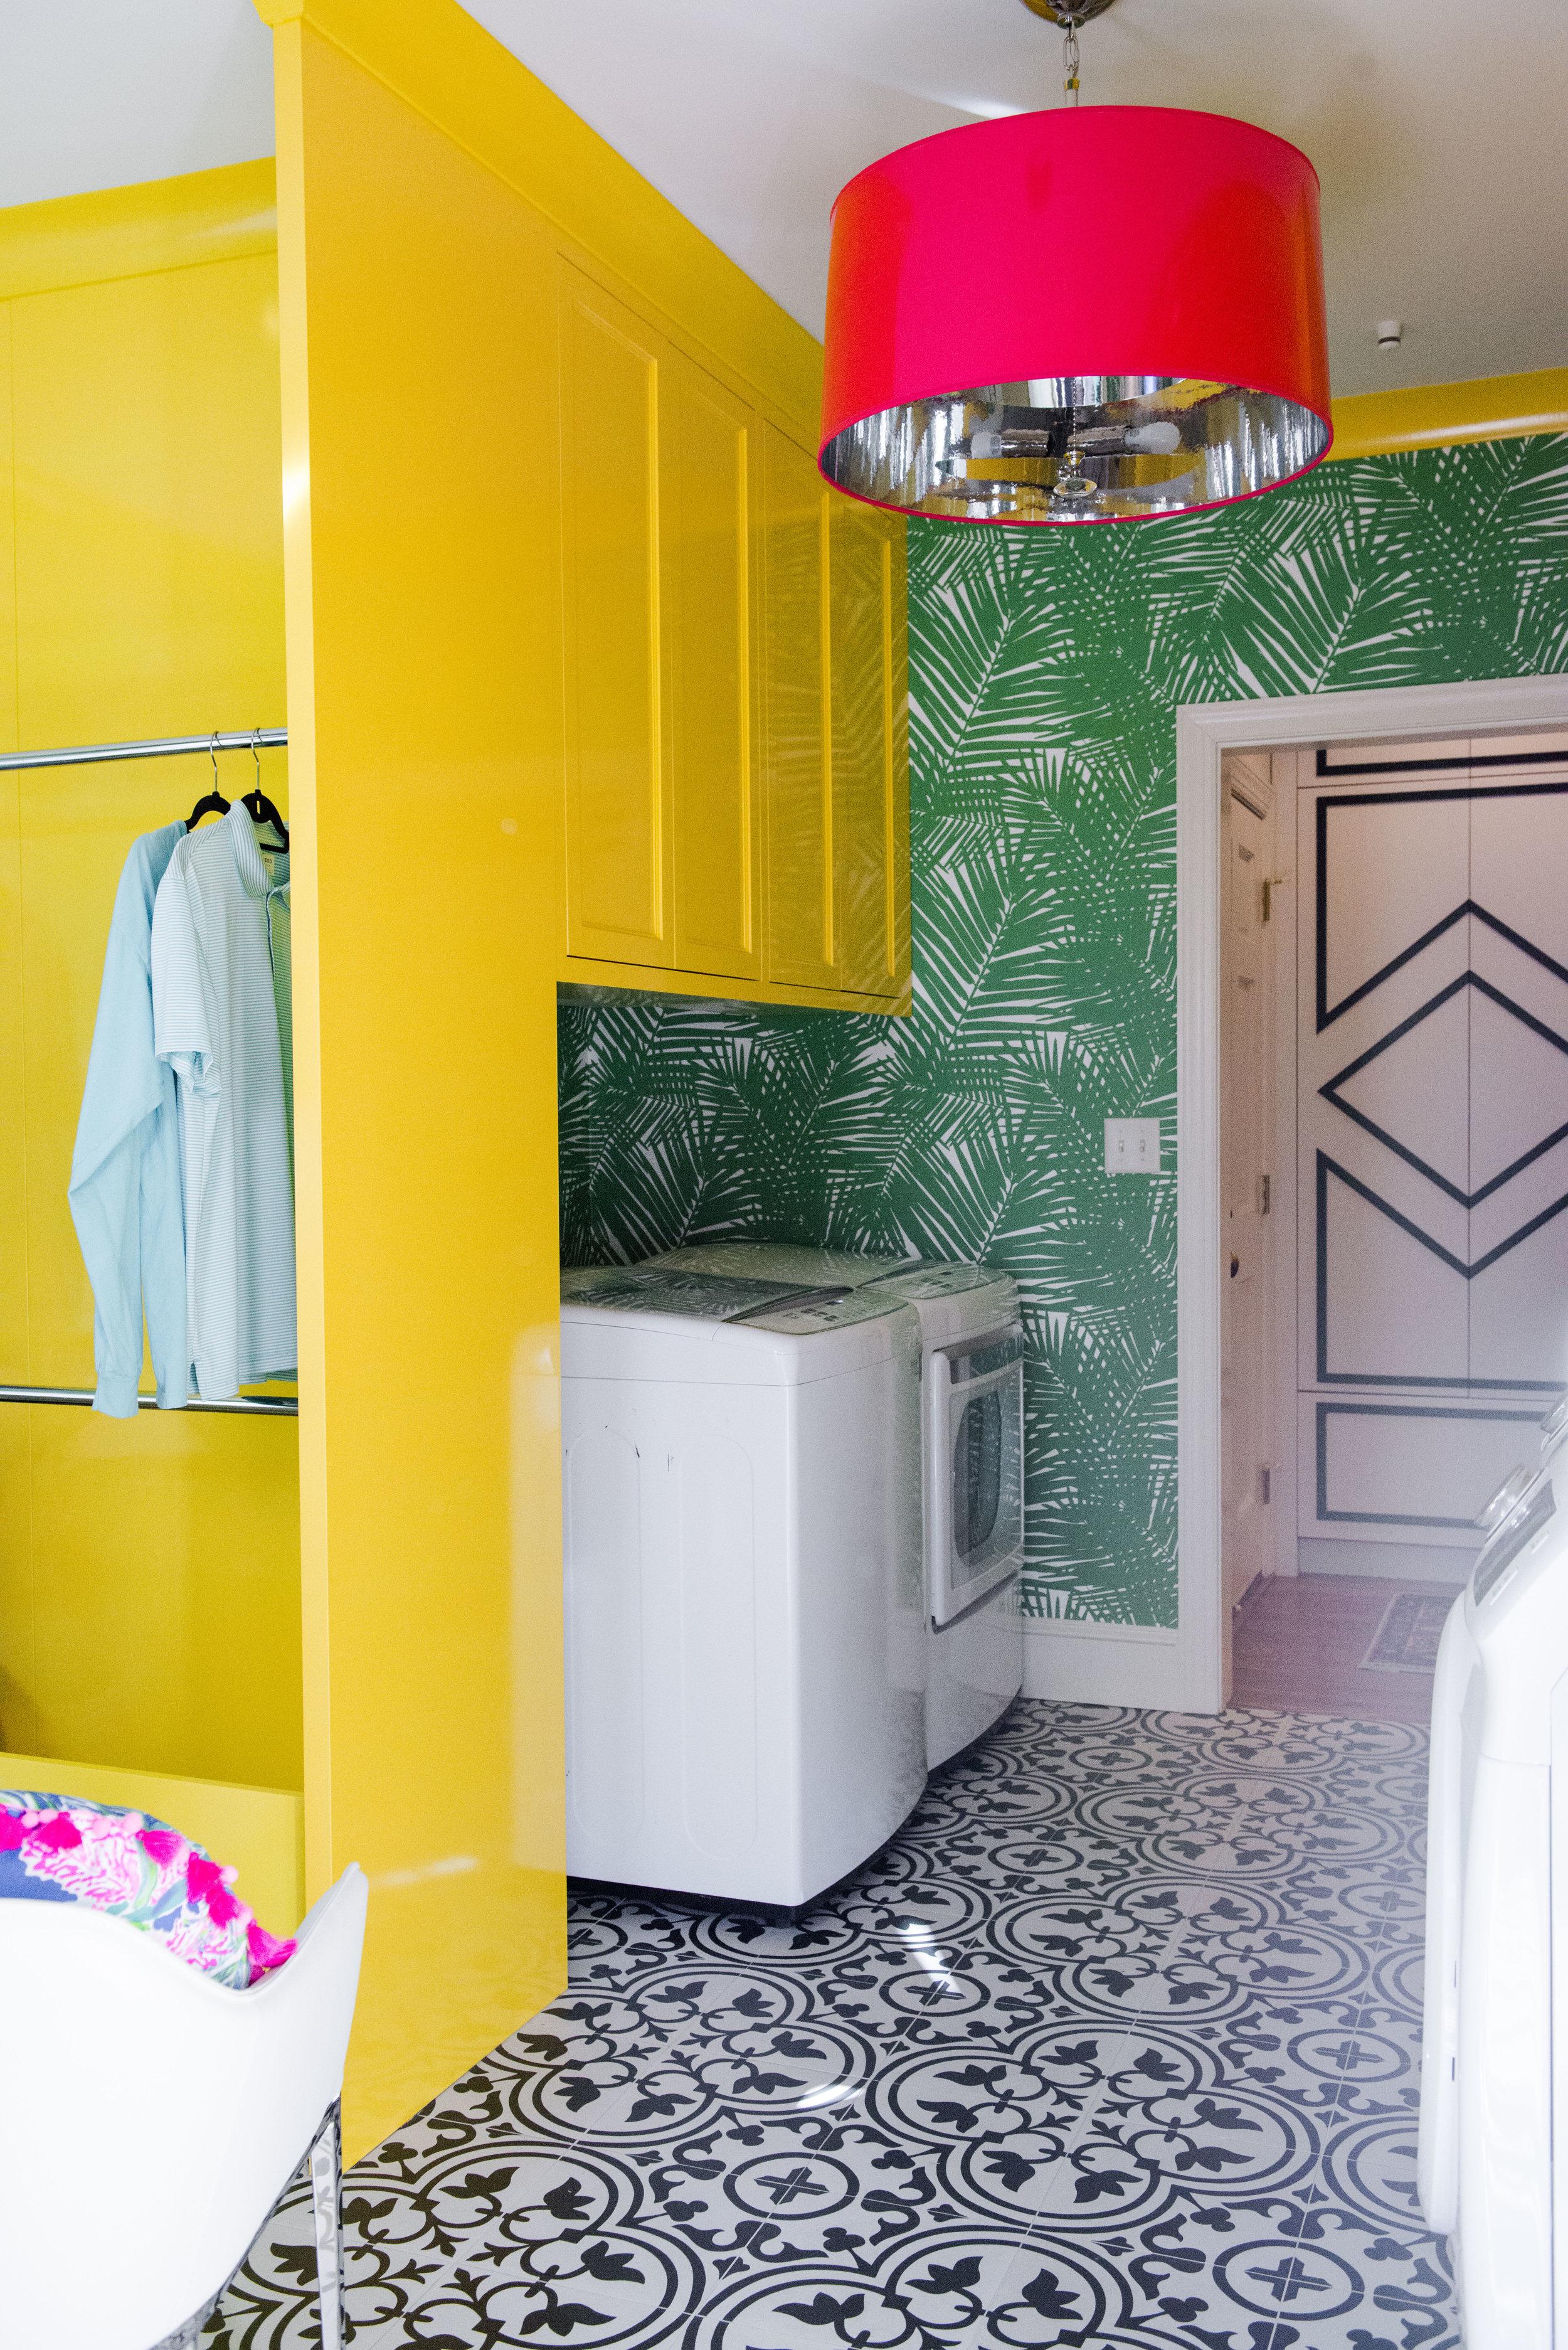 Designed by Katrina Porter Designs. Photographed by Paula Coldiron.